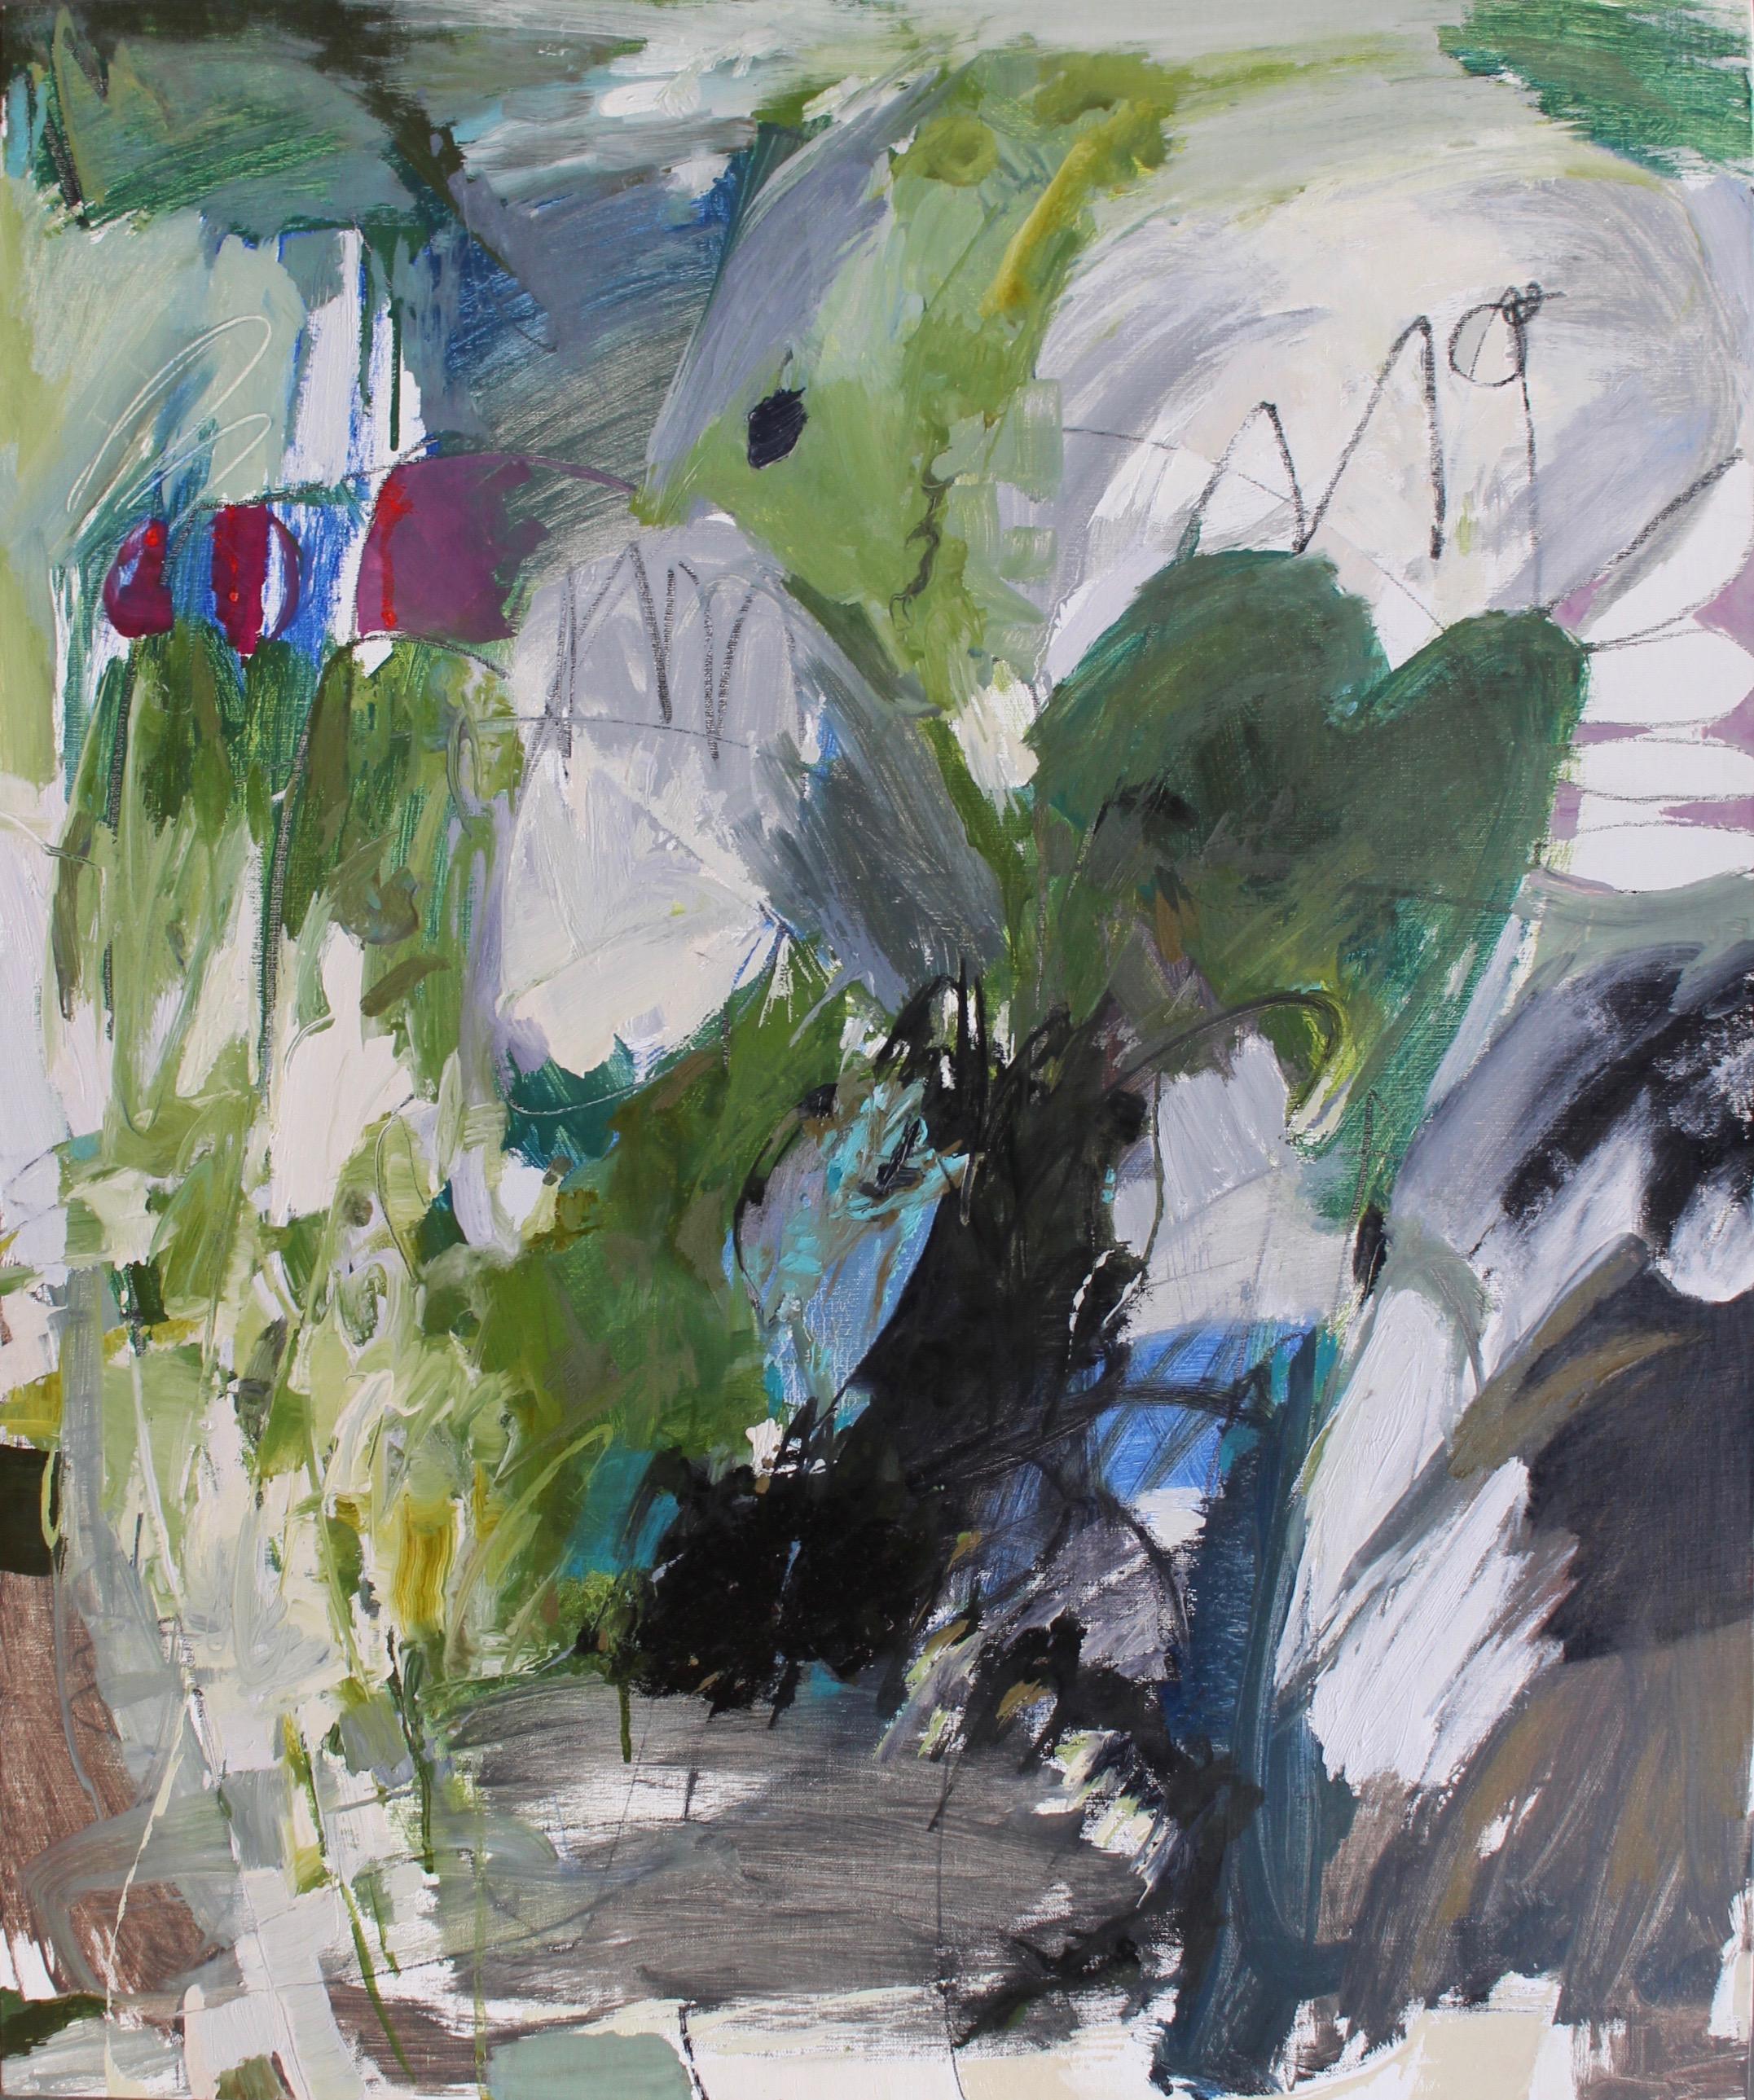 Broken Heartland, 2017 / Oil on linen panel, 24 x 20